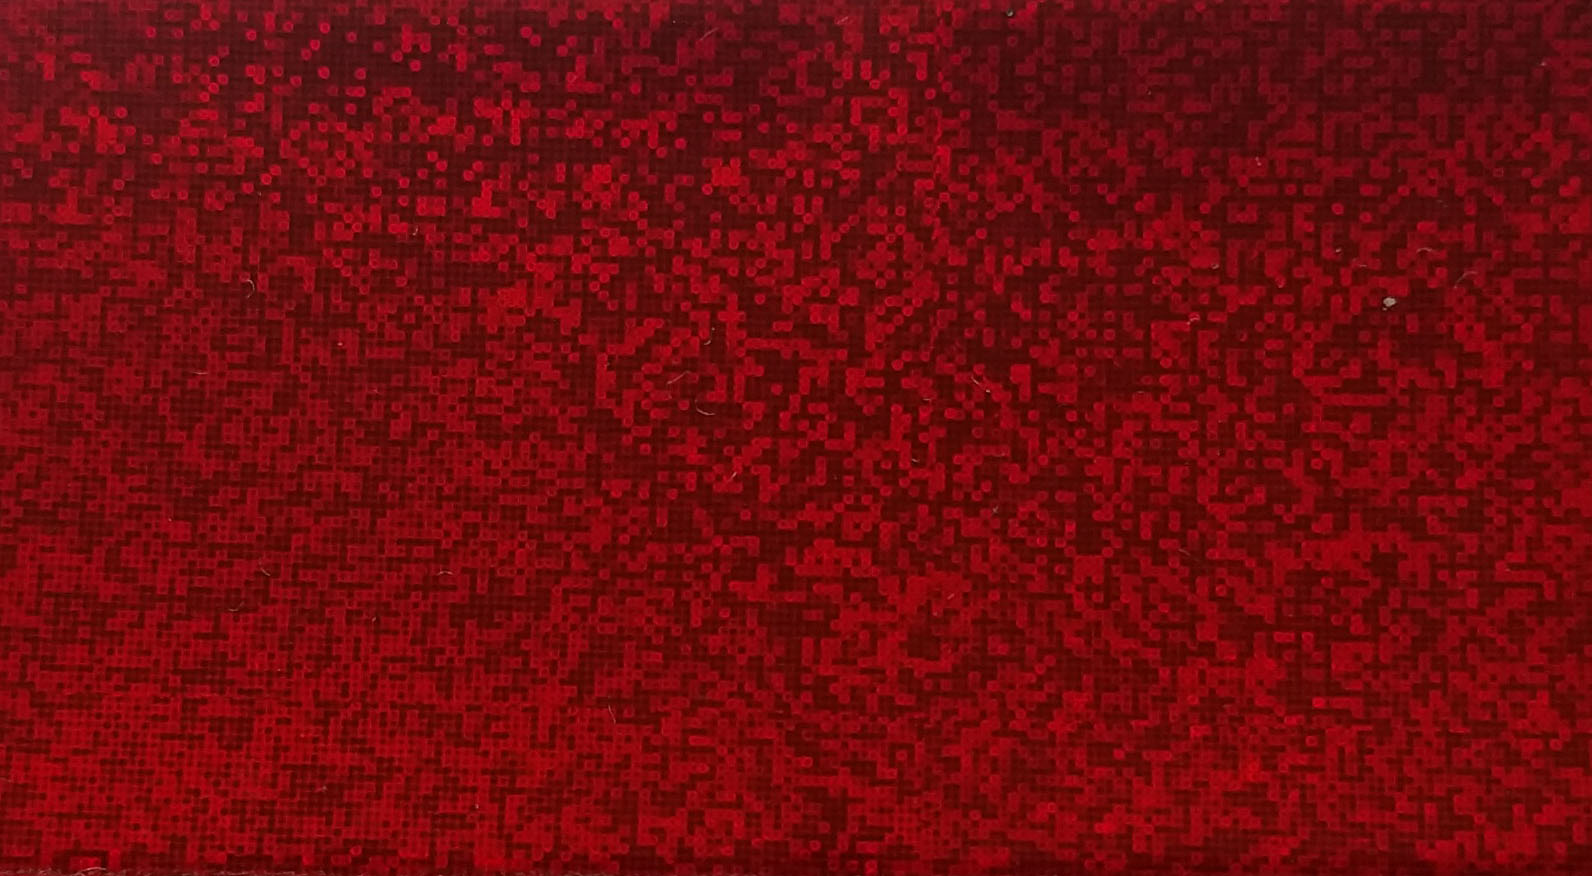 Red DigiSparkle Embroidery Vinyl - Sewing Vinyl - Craft Vinyl